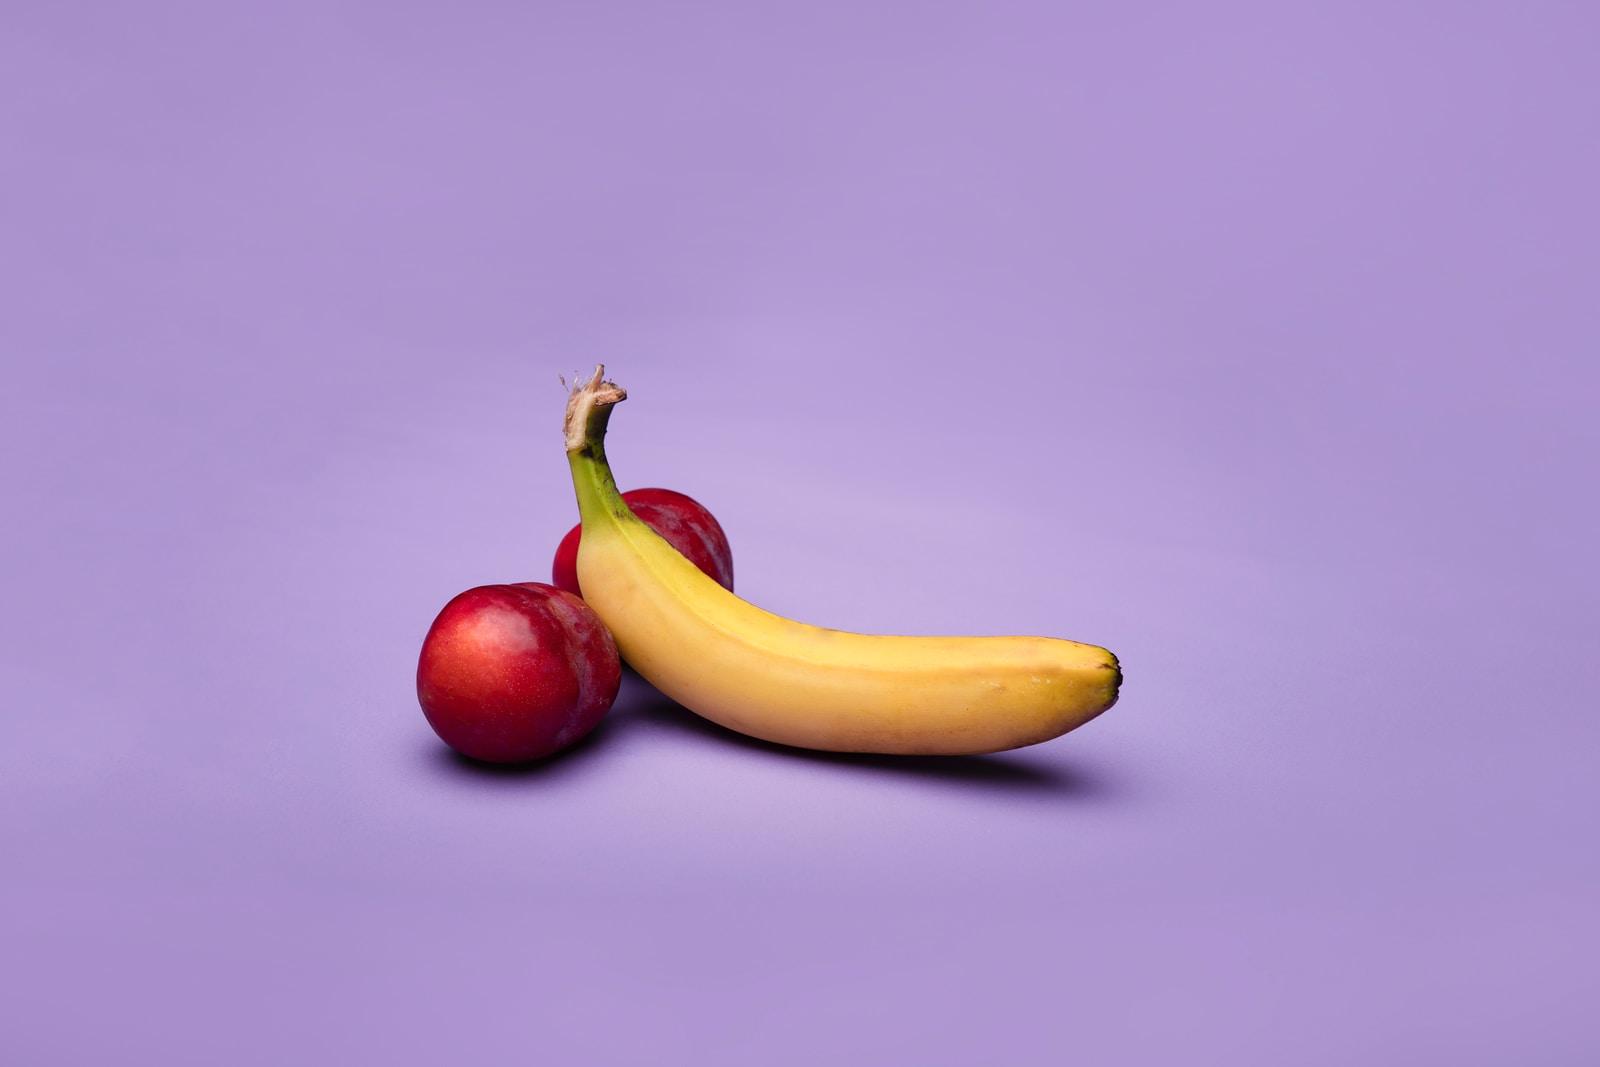 yellow banana fruit beside red apple fruit